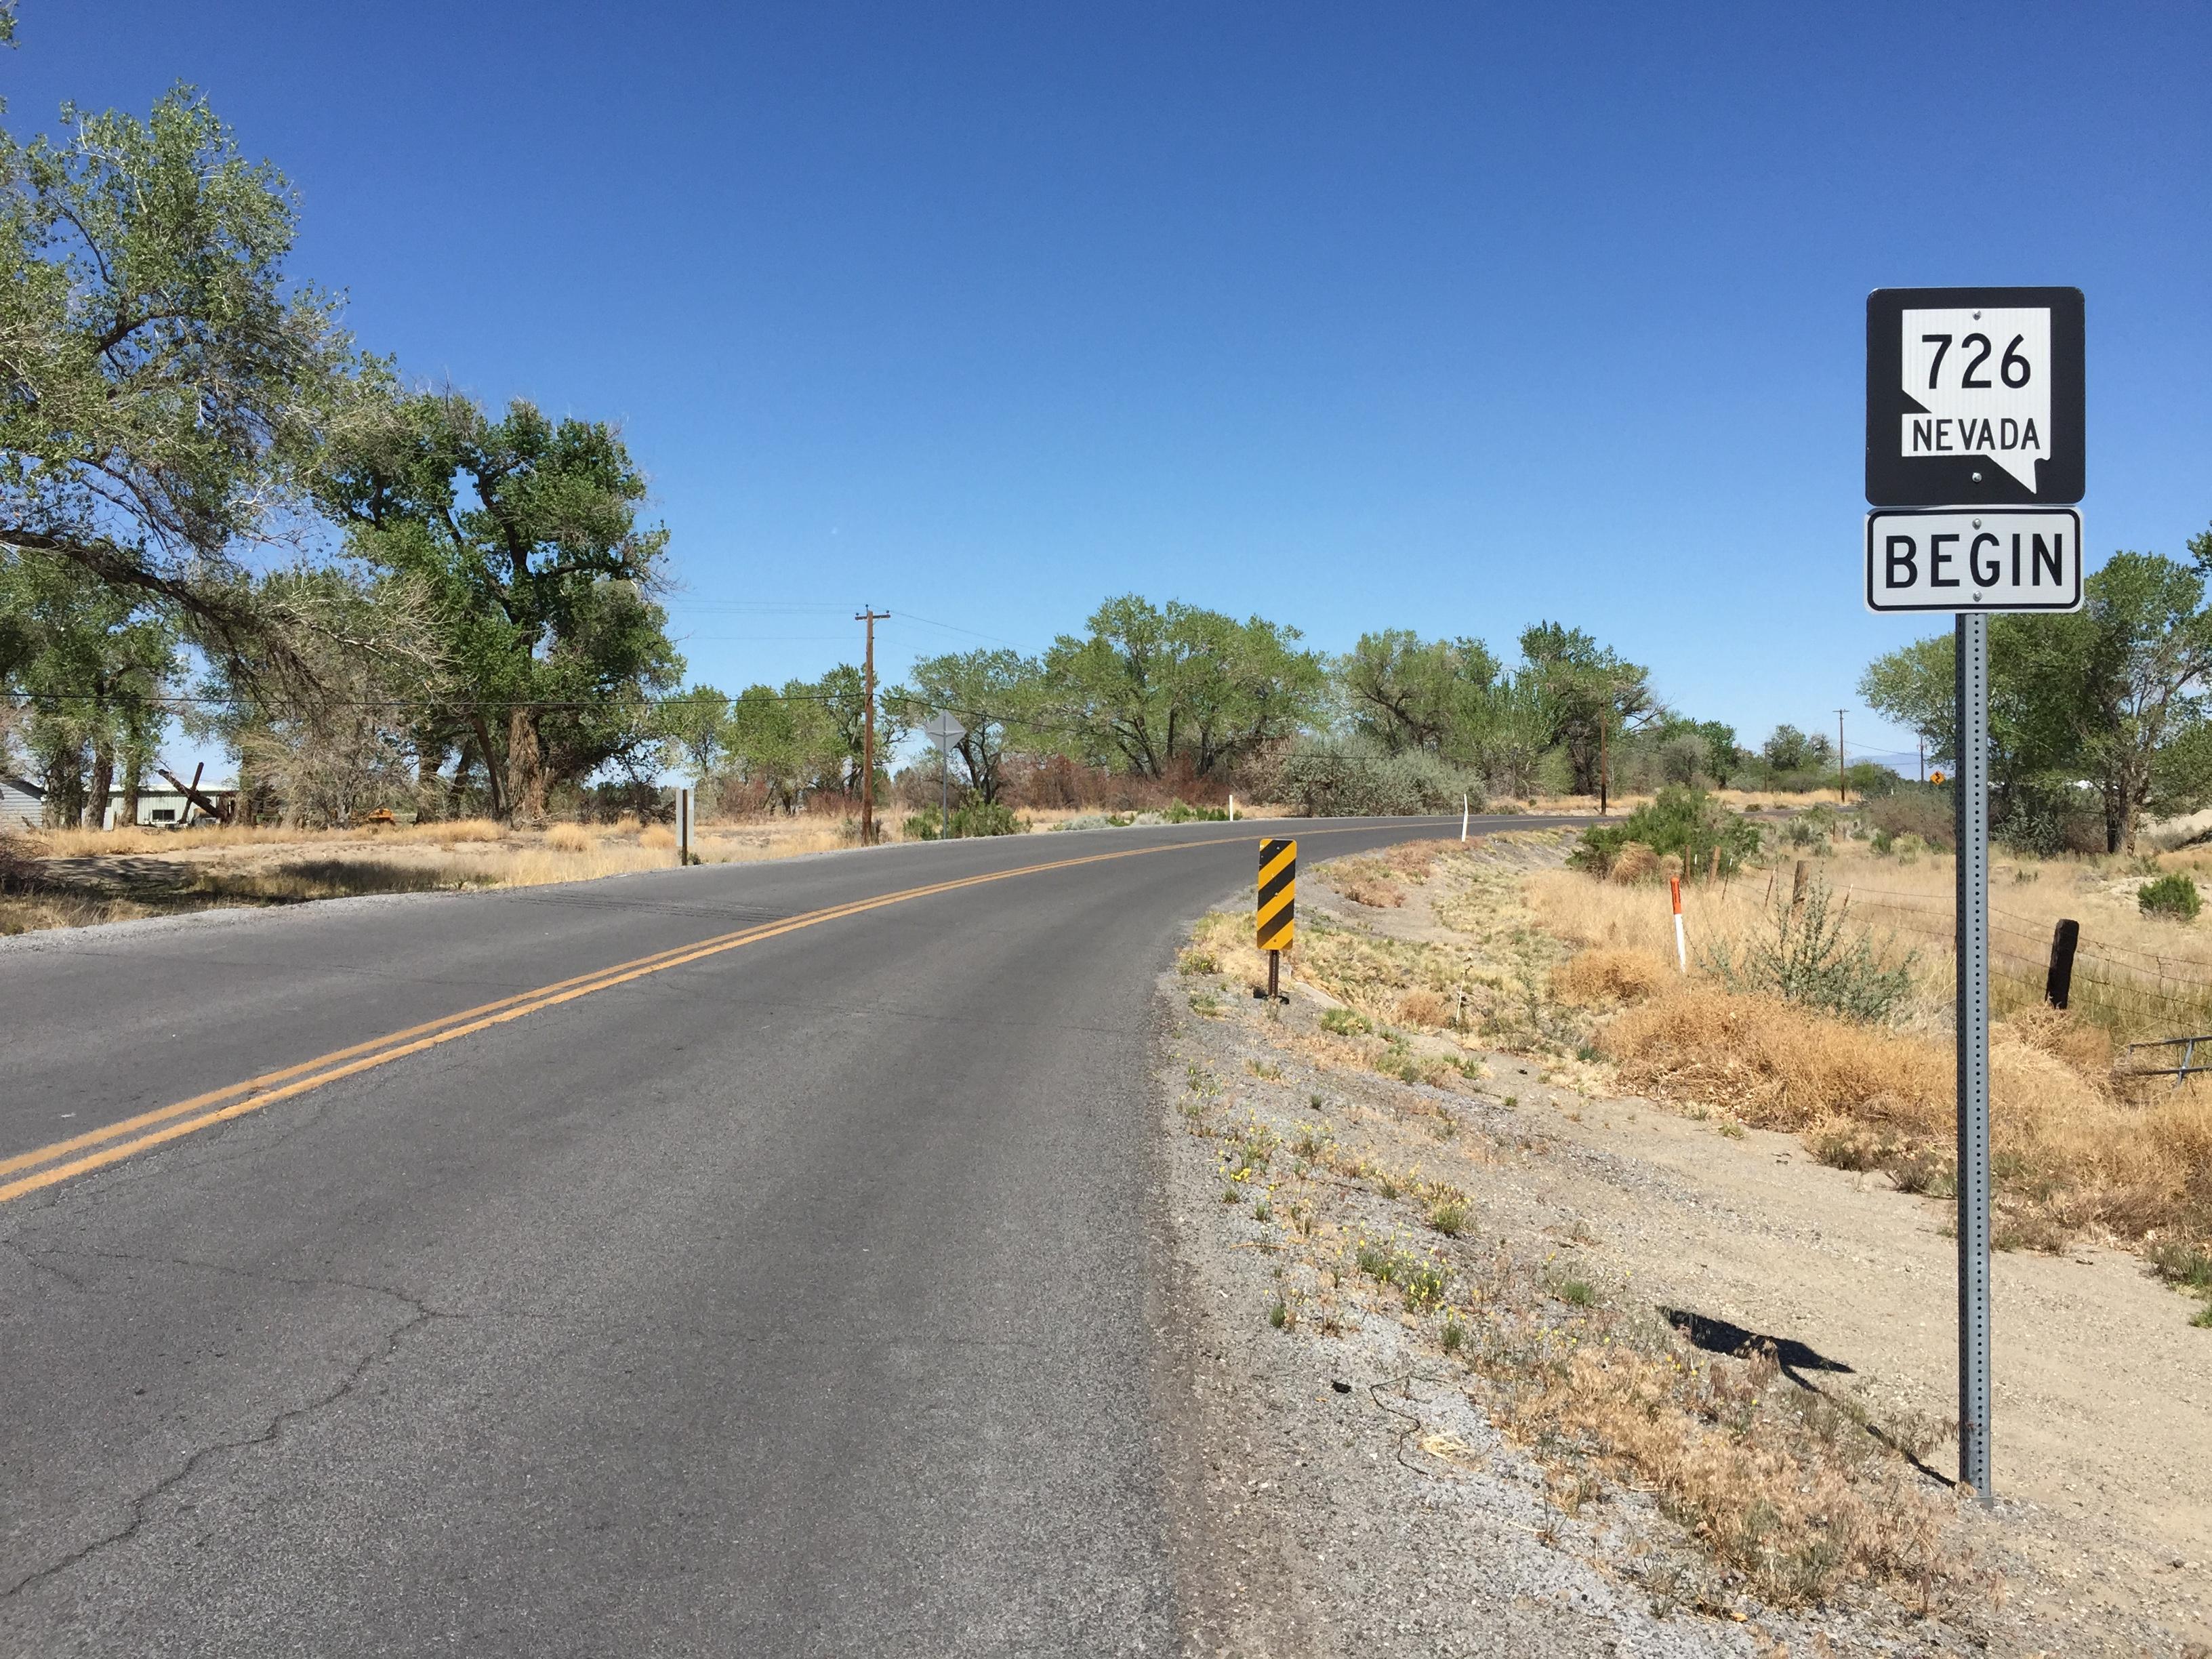 churchill county dating Choose the site nearest you: elko las vegas reno / tahoe .